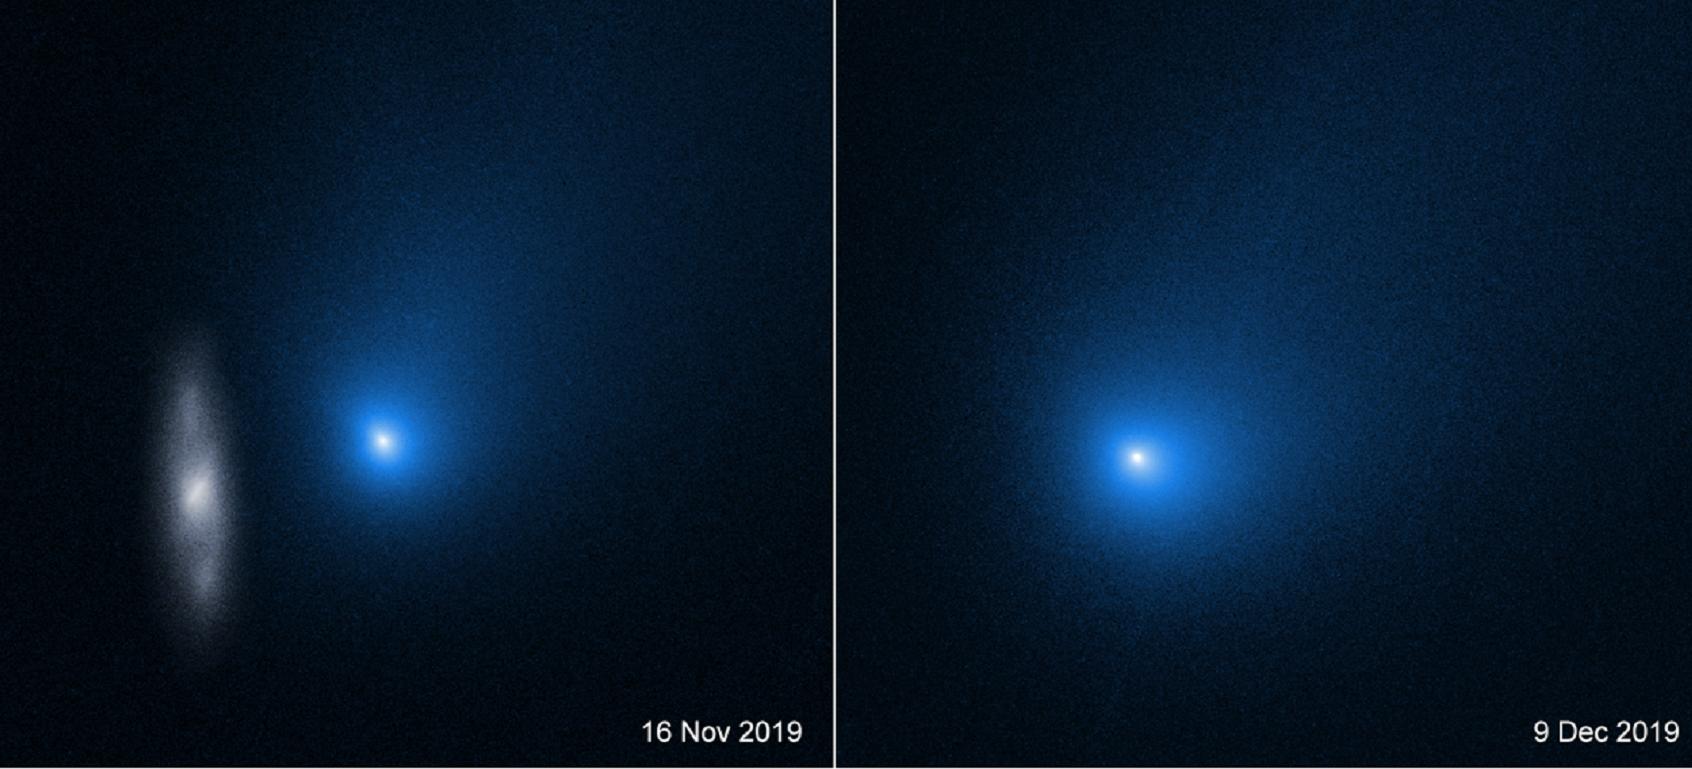 Dos imágenes del cometa 2I/Borisov fotografiadas por Hubble